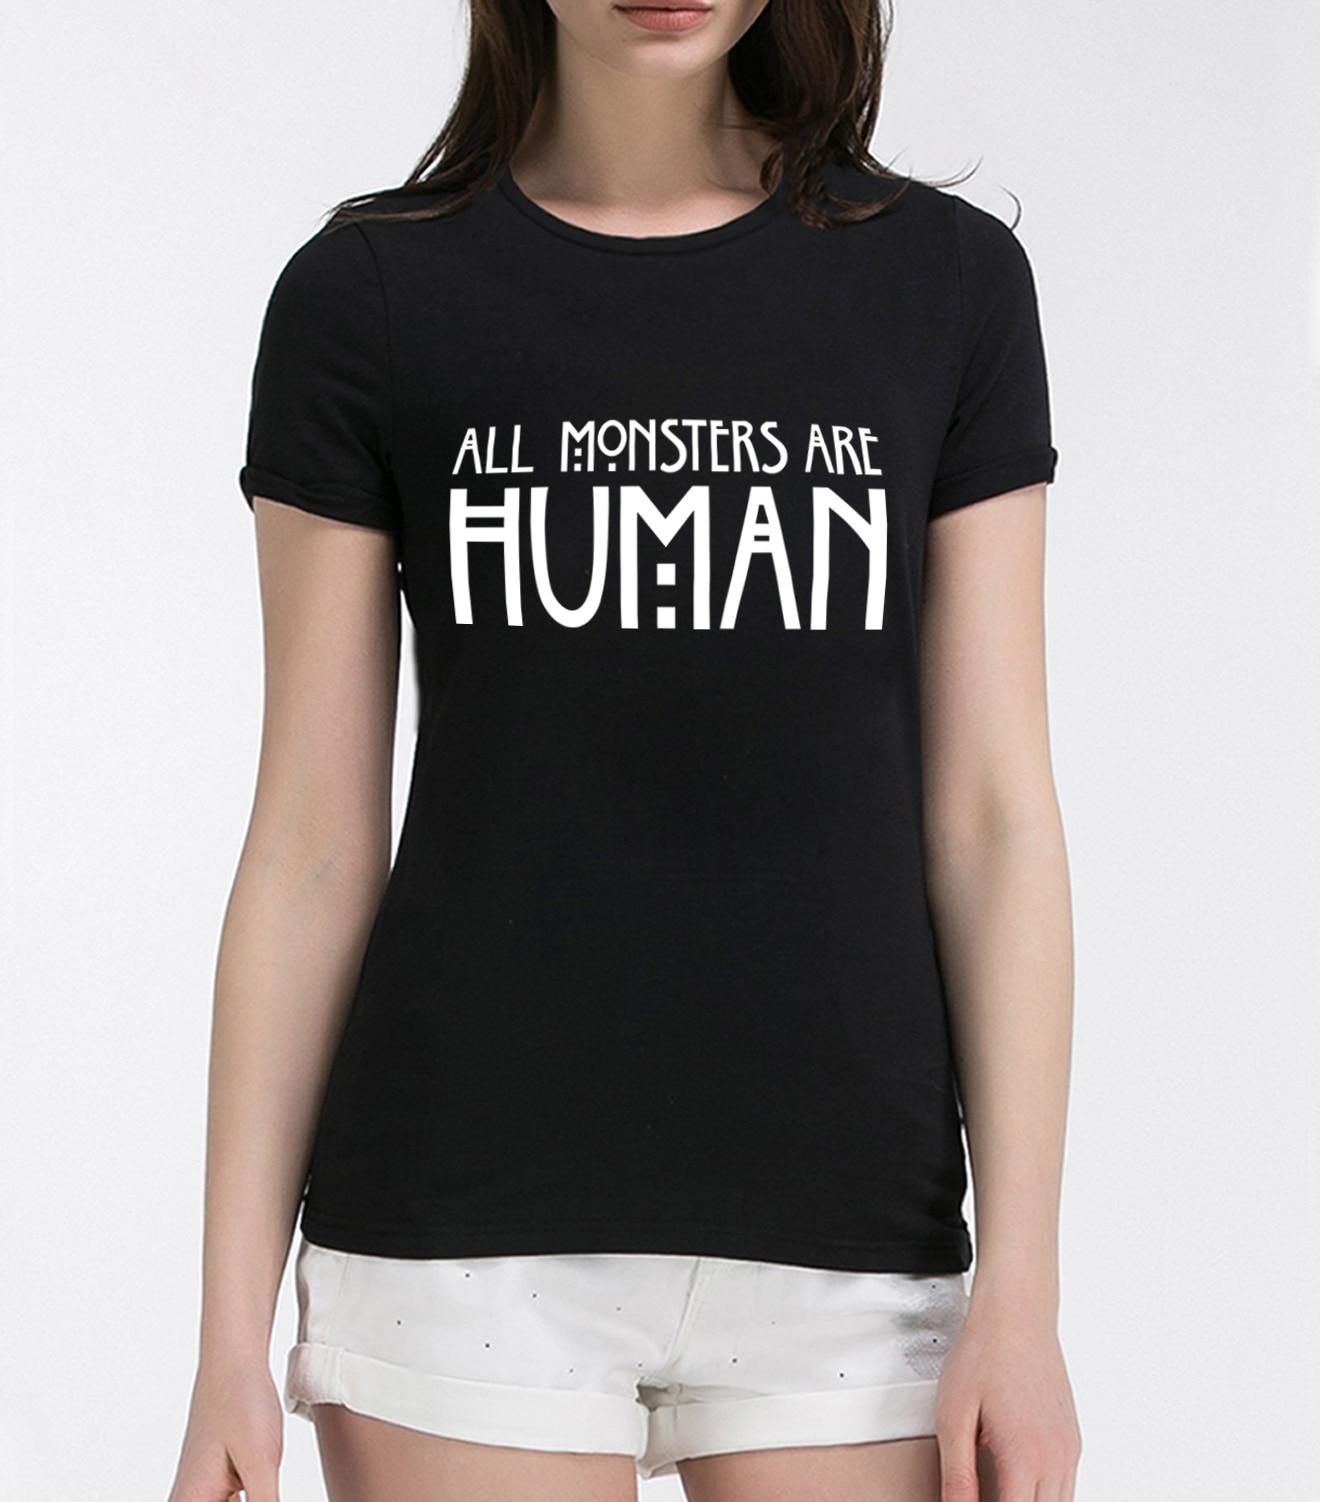 Black t shirt on girl - 2016 All Monsters Are Human Women Black Cotton T Shirt Girl Tops Tee Shirt T